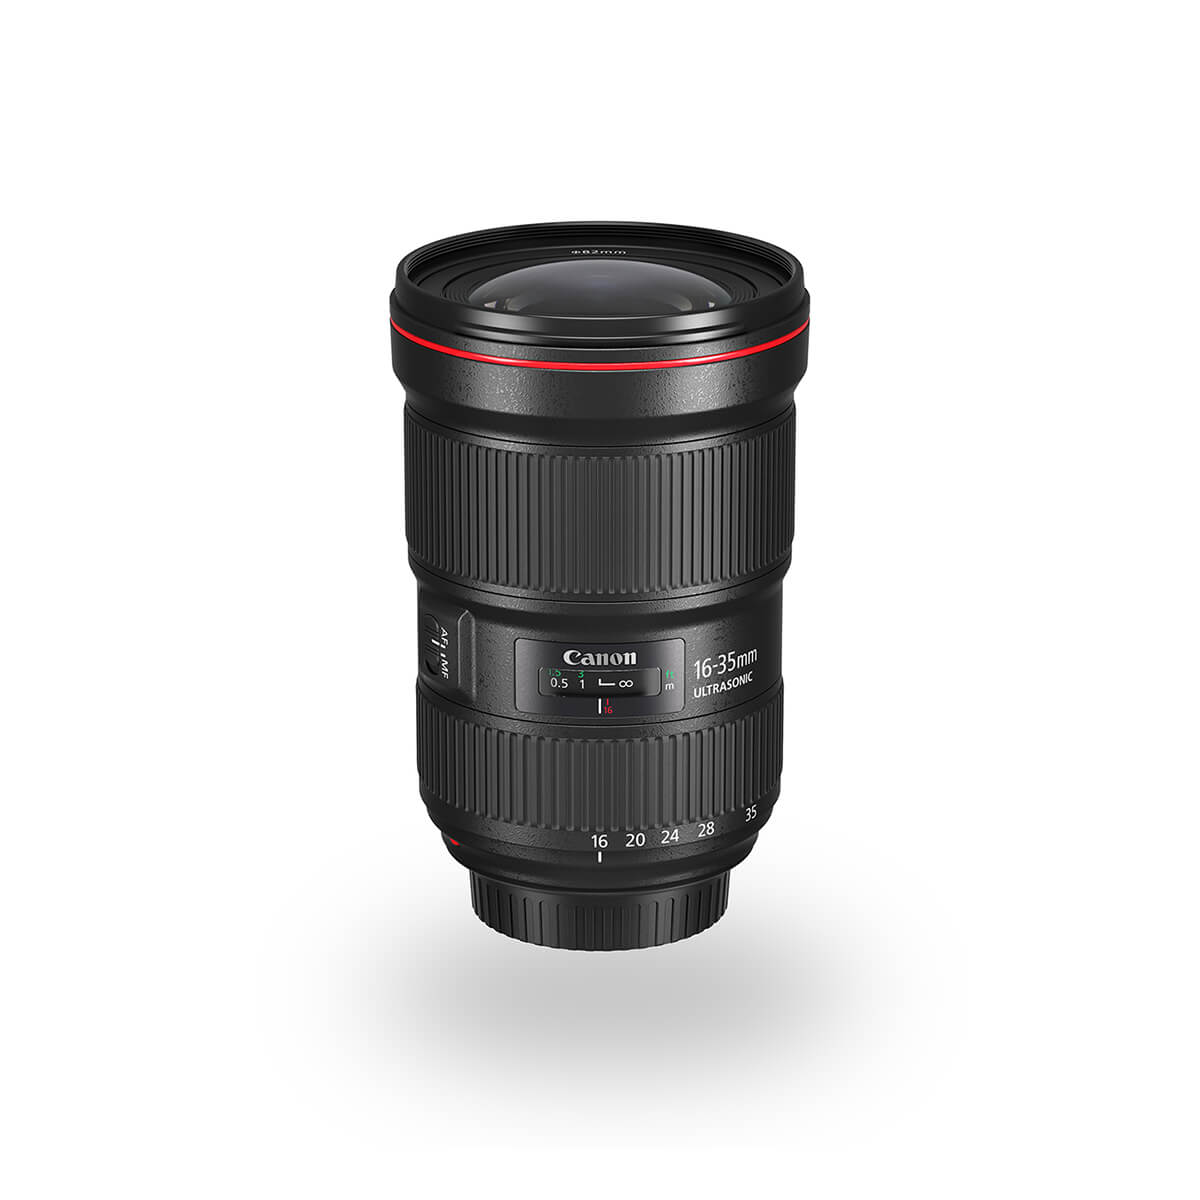 EF 16-35mm f/2/8 III USM